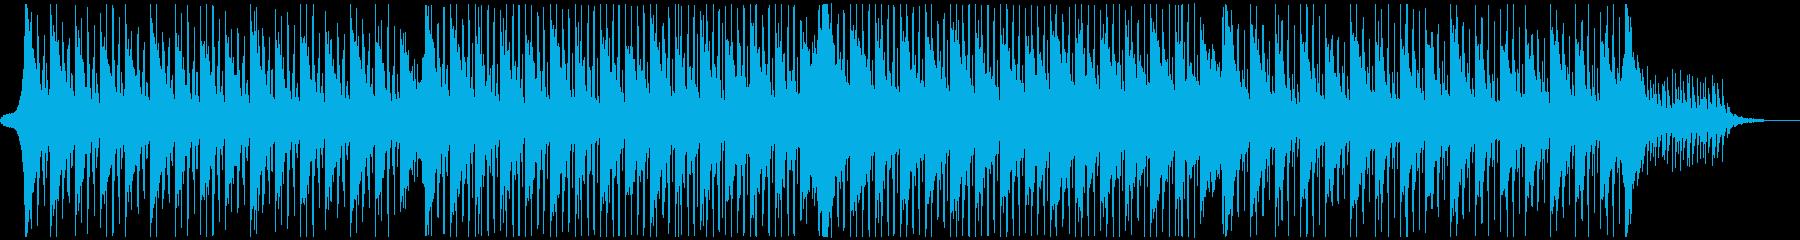 Gerberaの再生済みの波形